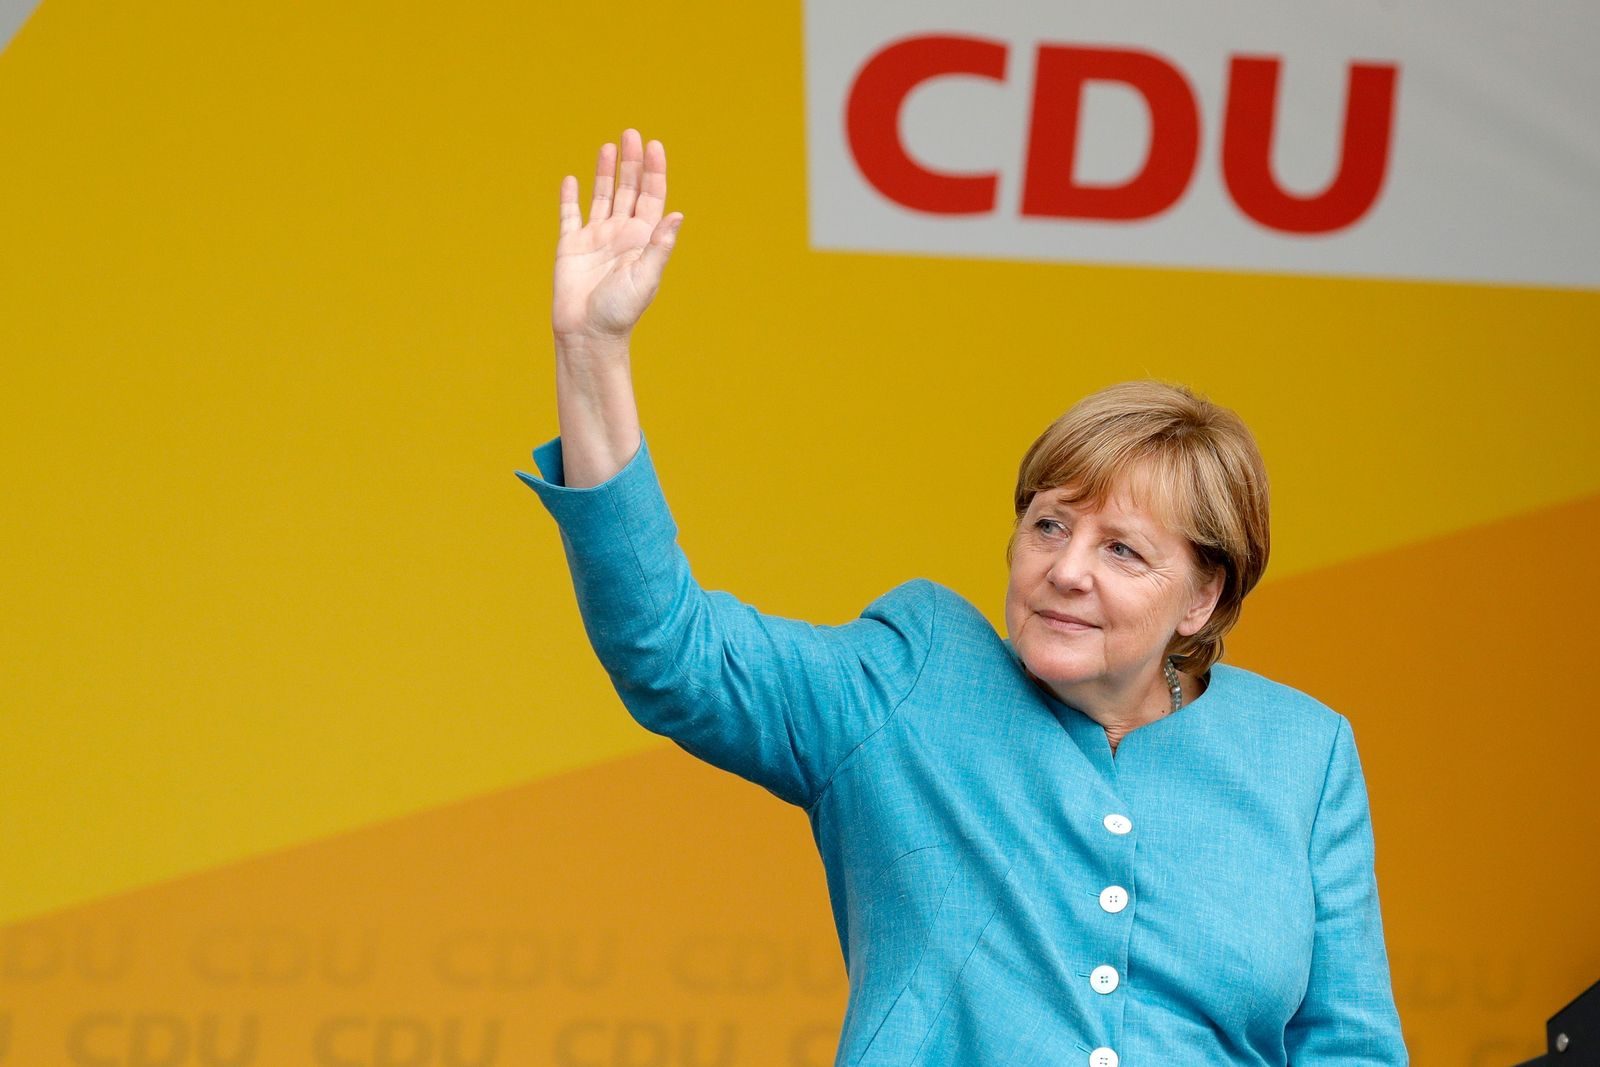 Angela Merkel / Wahlkampf / Koblenz